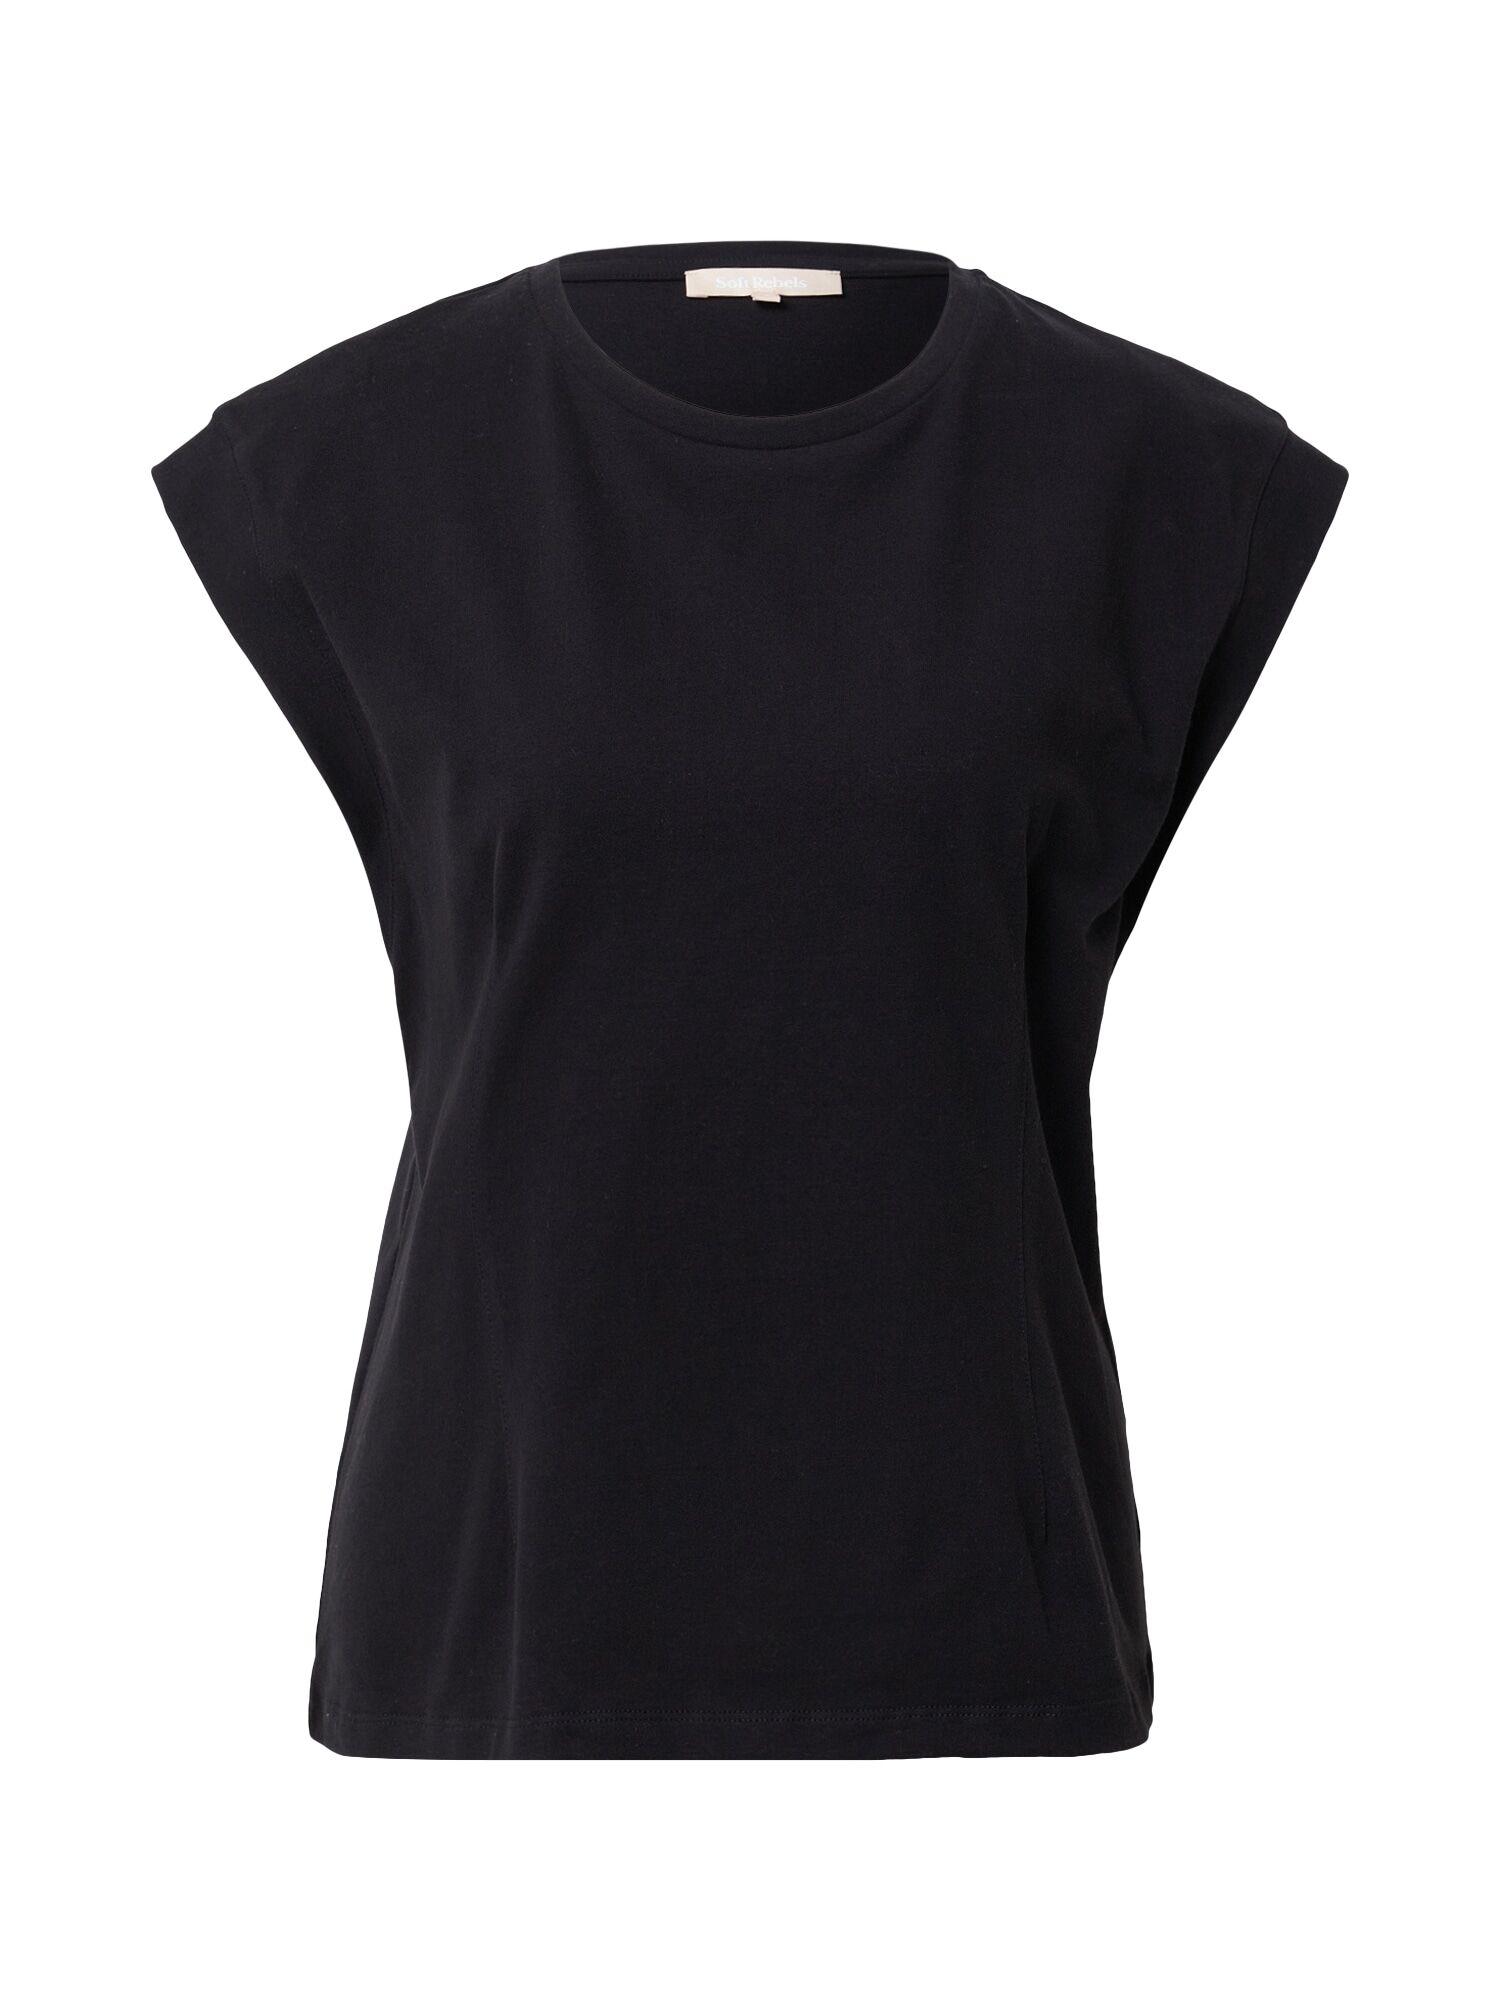 Soft Rebels T-shirt 'Winona'  - Noir - Taille: XL - female